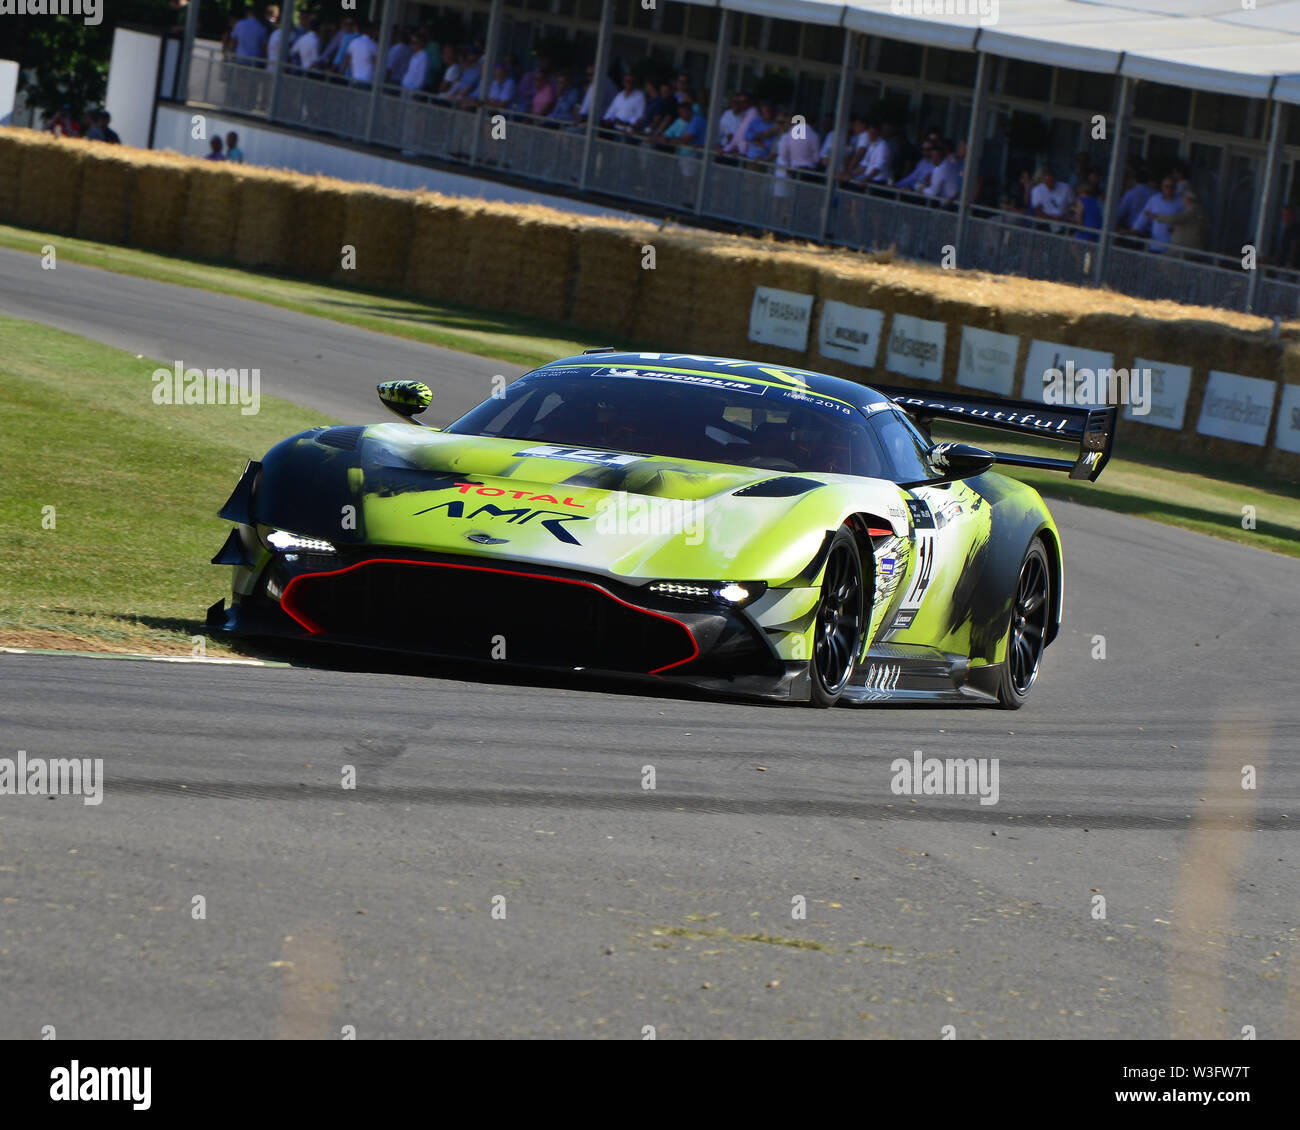 Marek Reichman, Aston Martin Vulcan AMR Pro, Goodwood Festival of Speed, 2019, Festival of Speed, Speed Kings, Motorsport's Record Breakers, July 2019 - Stock Image